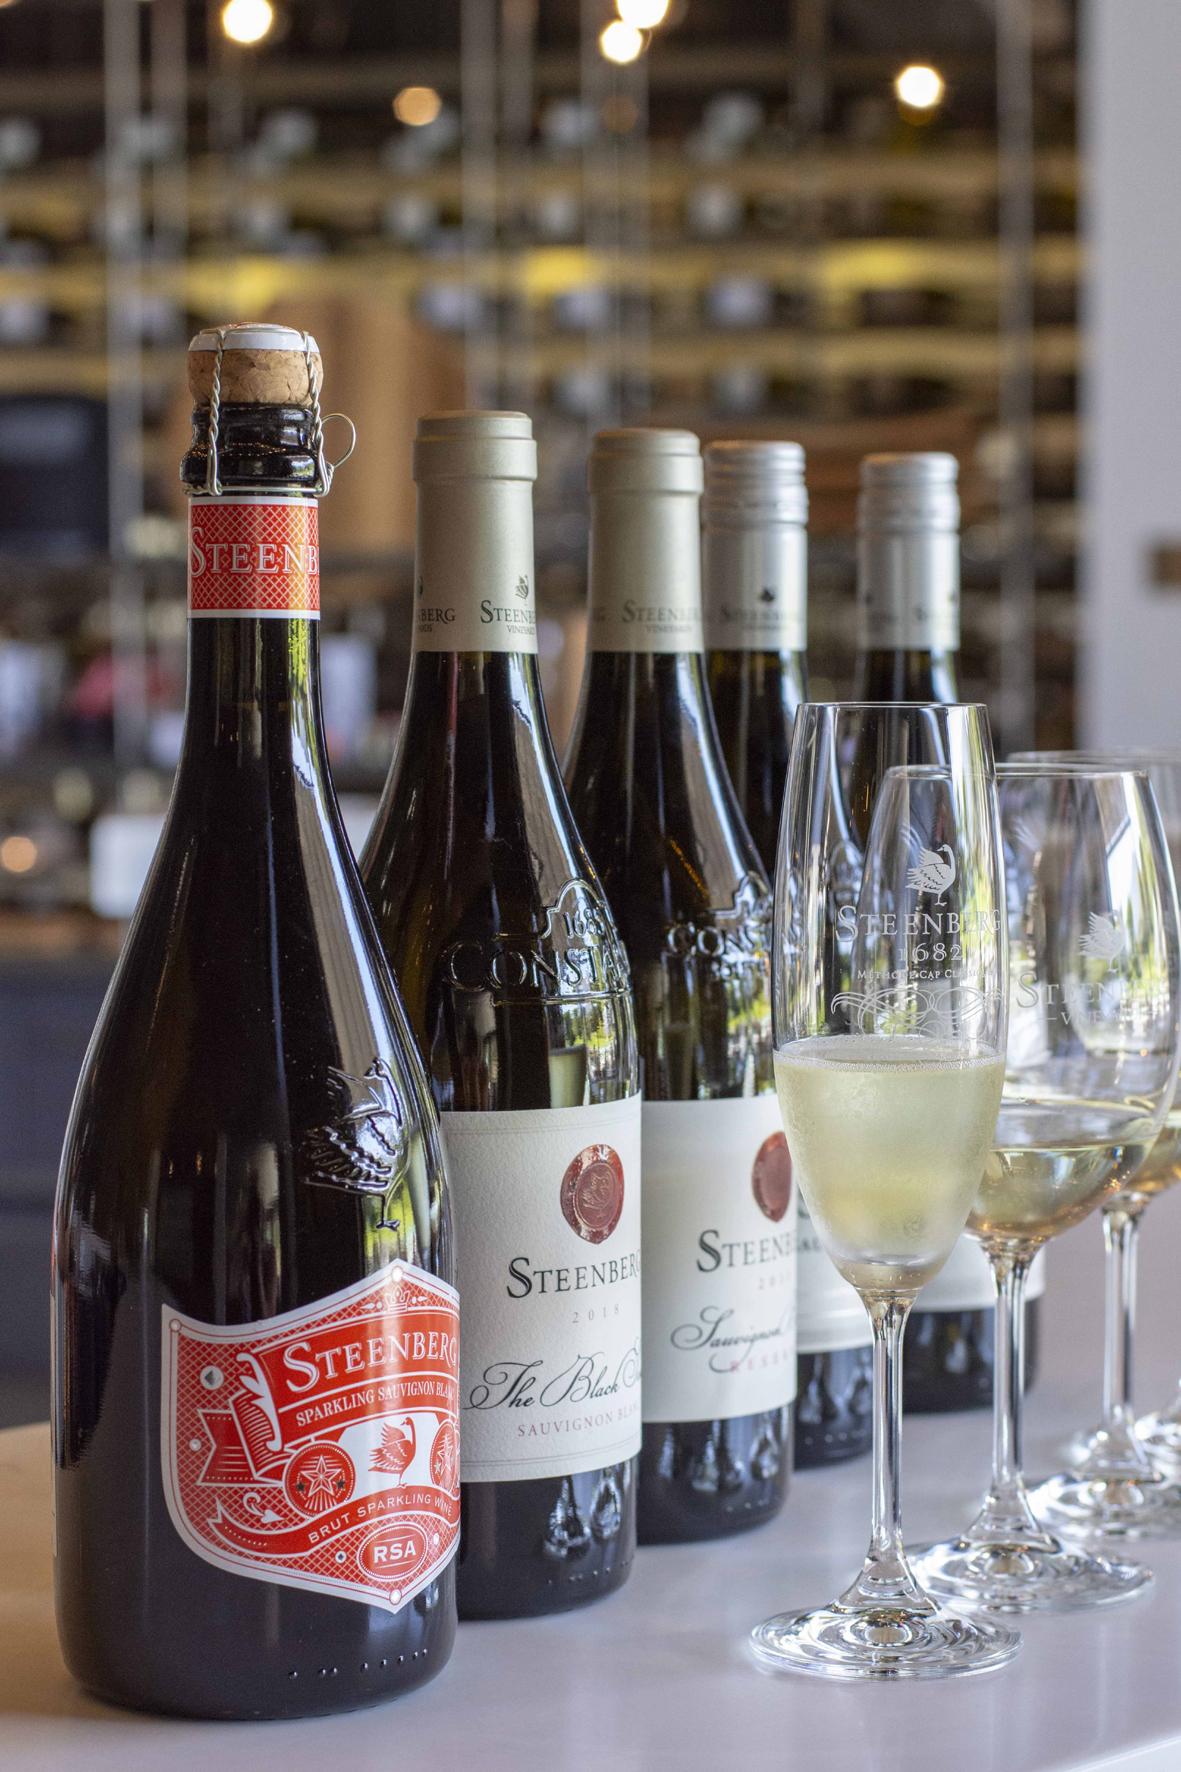 Steenberg's unique offering this International Sauvignon Blanc Day